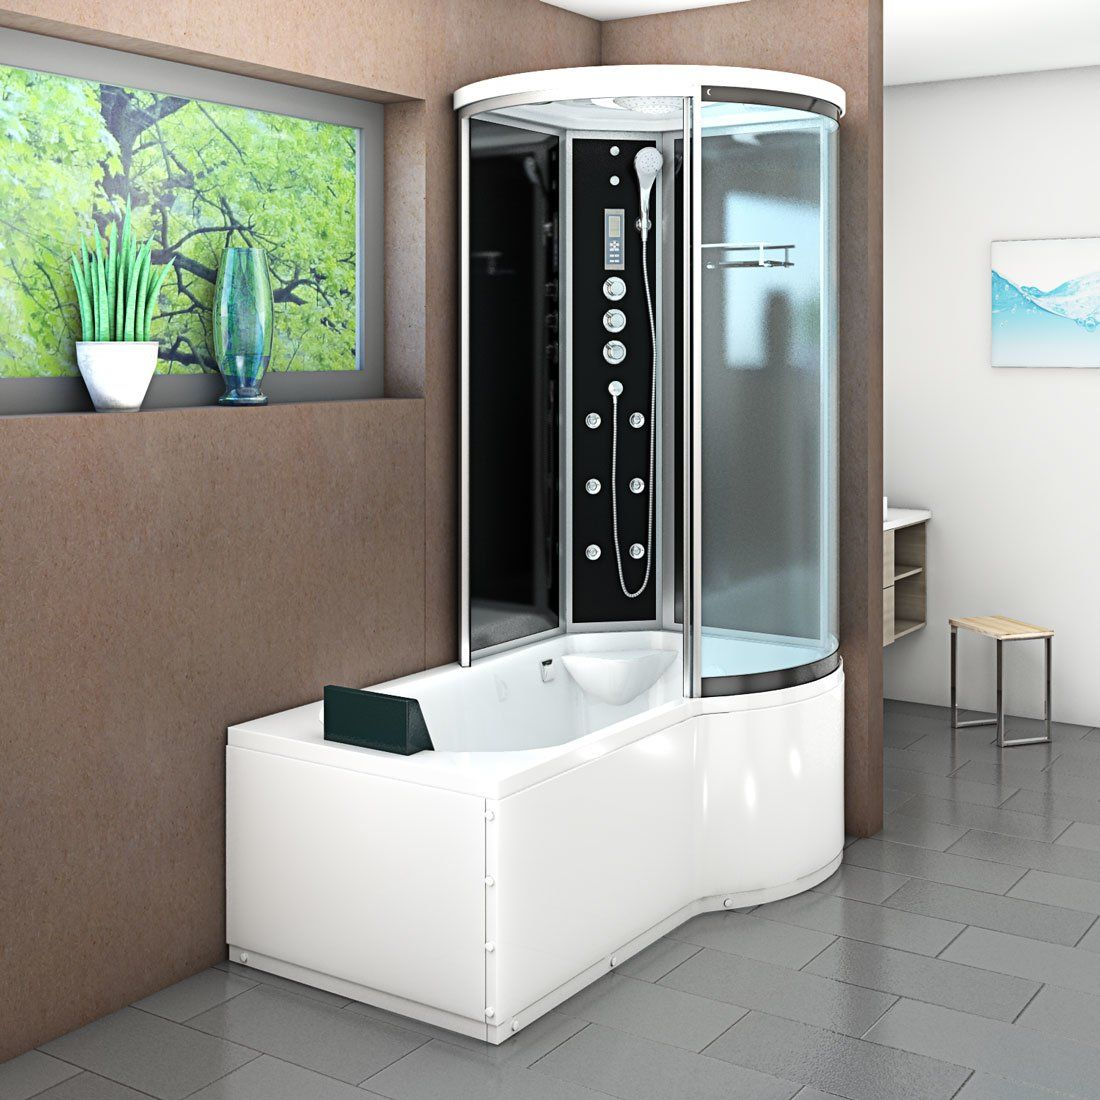 Acquavapore Dtp8055 Sw Whirlpool Badewanne Dusche Duschkabine 170x 859 00 Badewanne Mit Dusche Badewanne Duschkabine